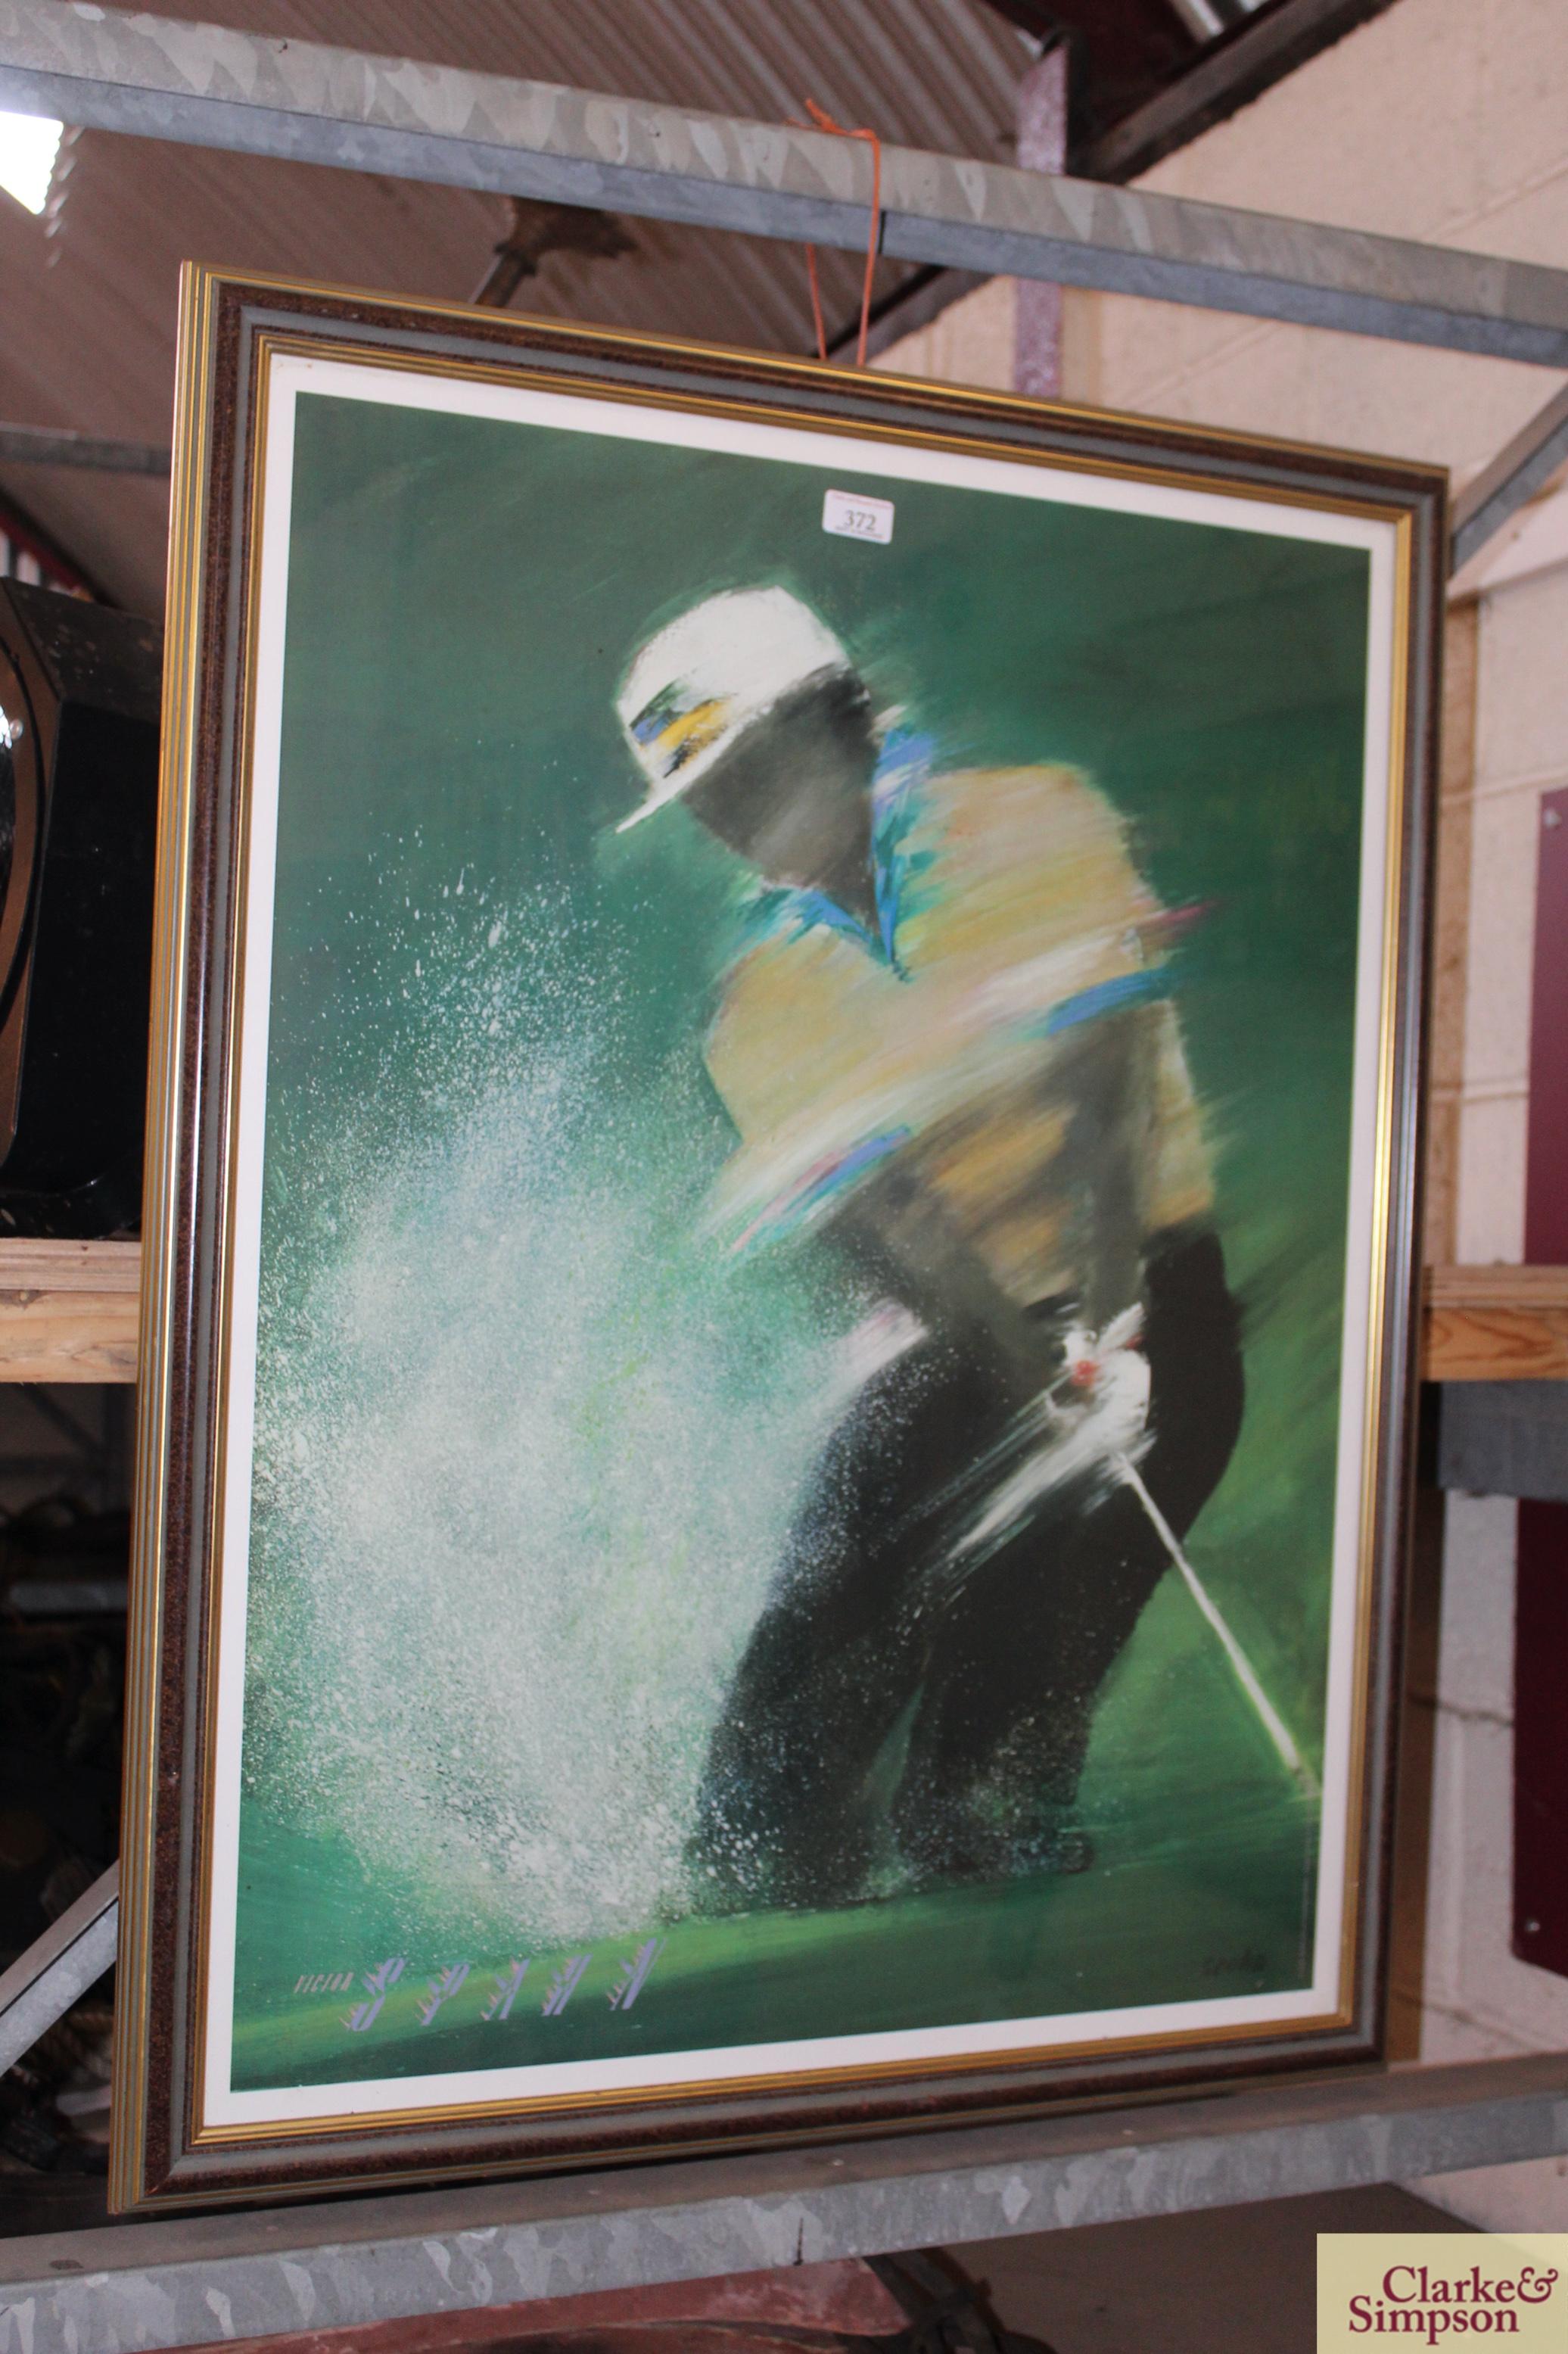 A Lee Travino framed golfing print